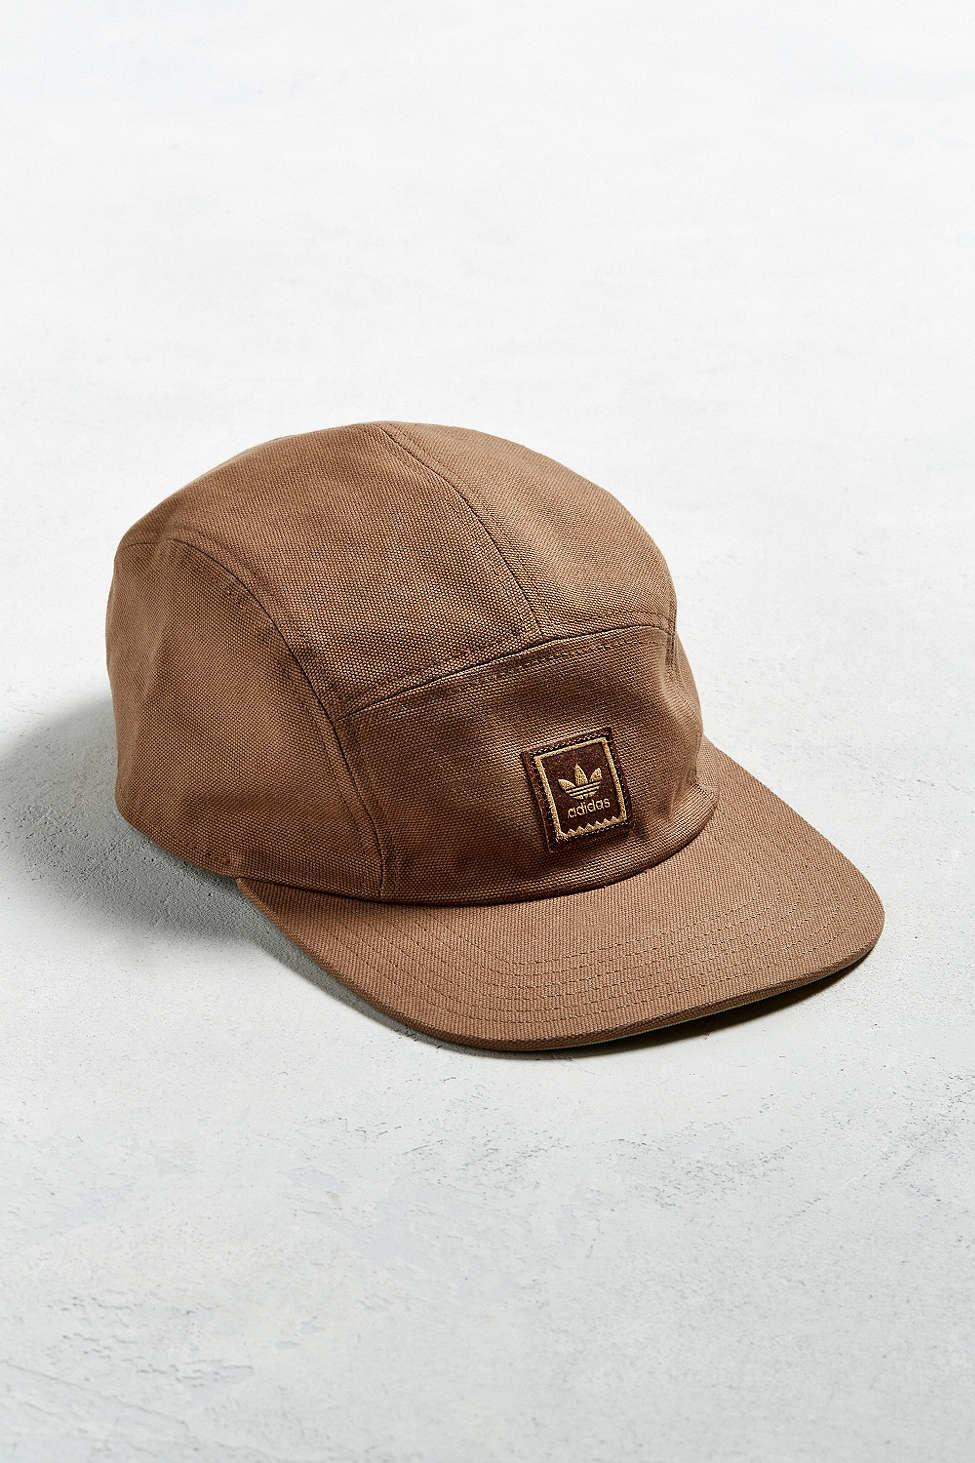 Lyst - adidas Originals Sk8 5-panel Hat in Brown for Men d74a8c2616e